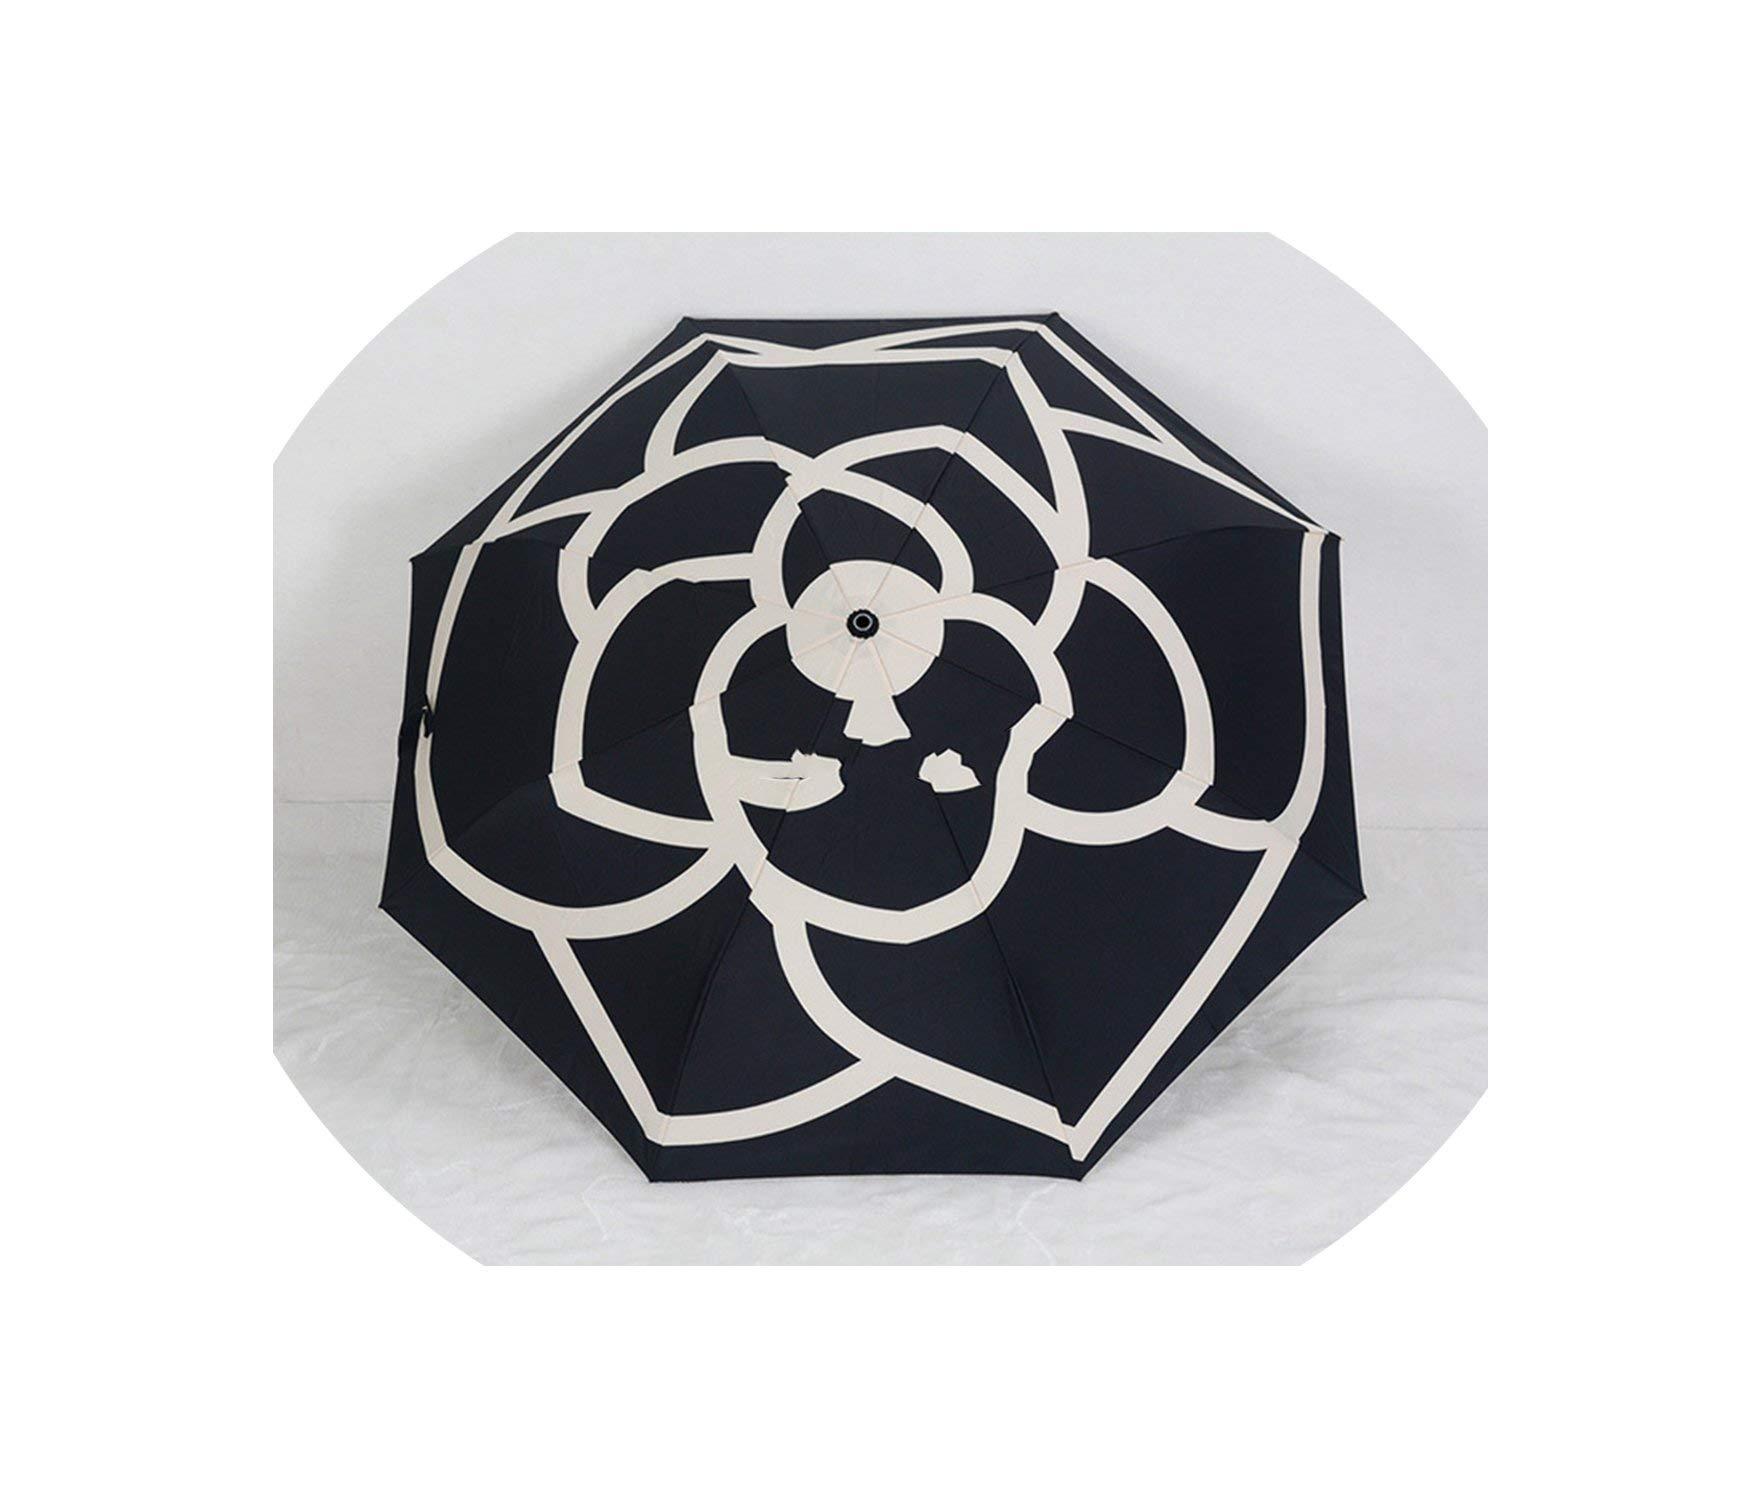 Folding Umbrella Classic Pattern Camellia Flower Logo Umbrella For Women 3 Fold Umbrella With Box And Bag Rain Umbrella,B